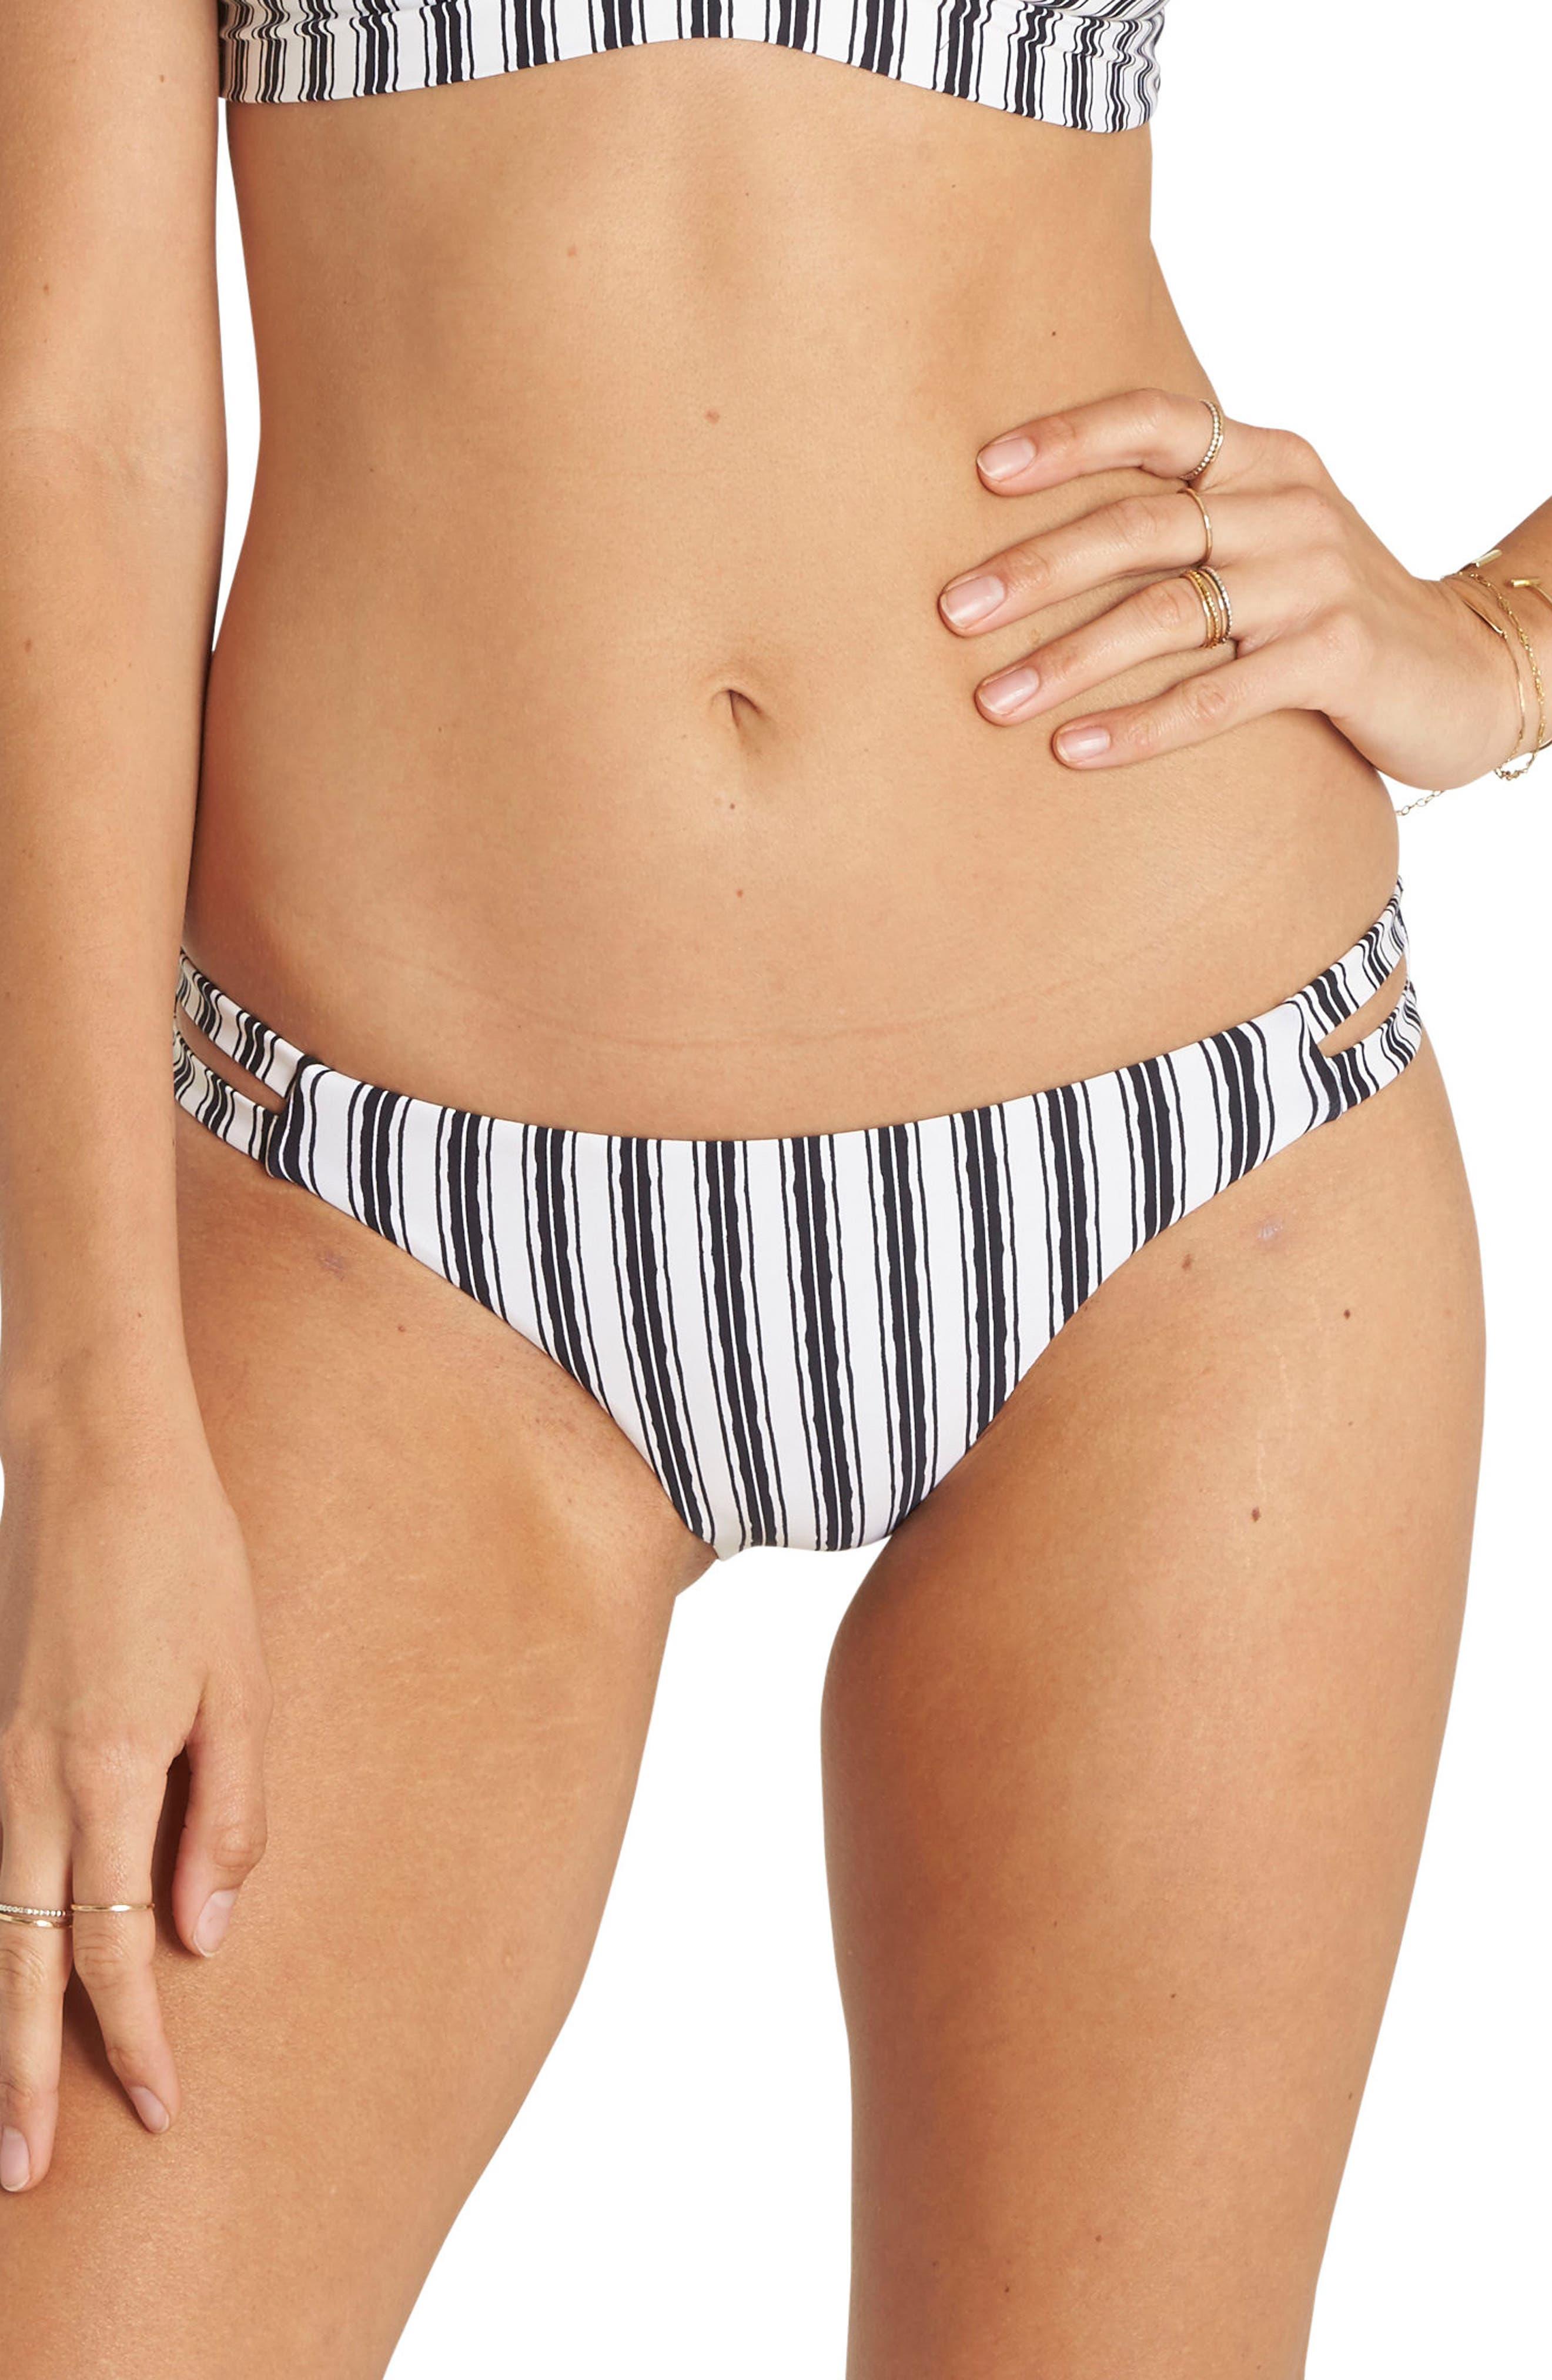 Get in Line Lowrider Bikini Bottoms,                         Main,                         color, 001